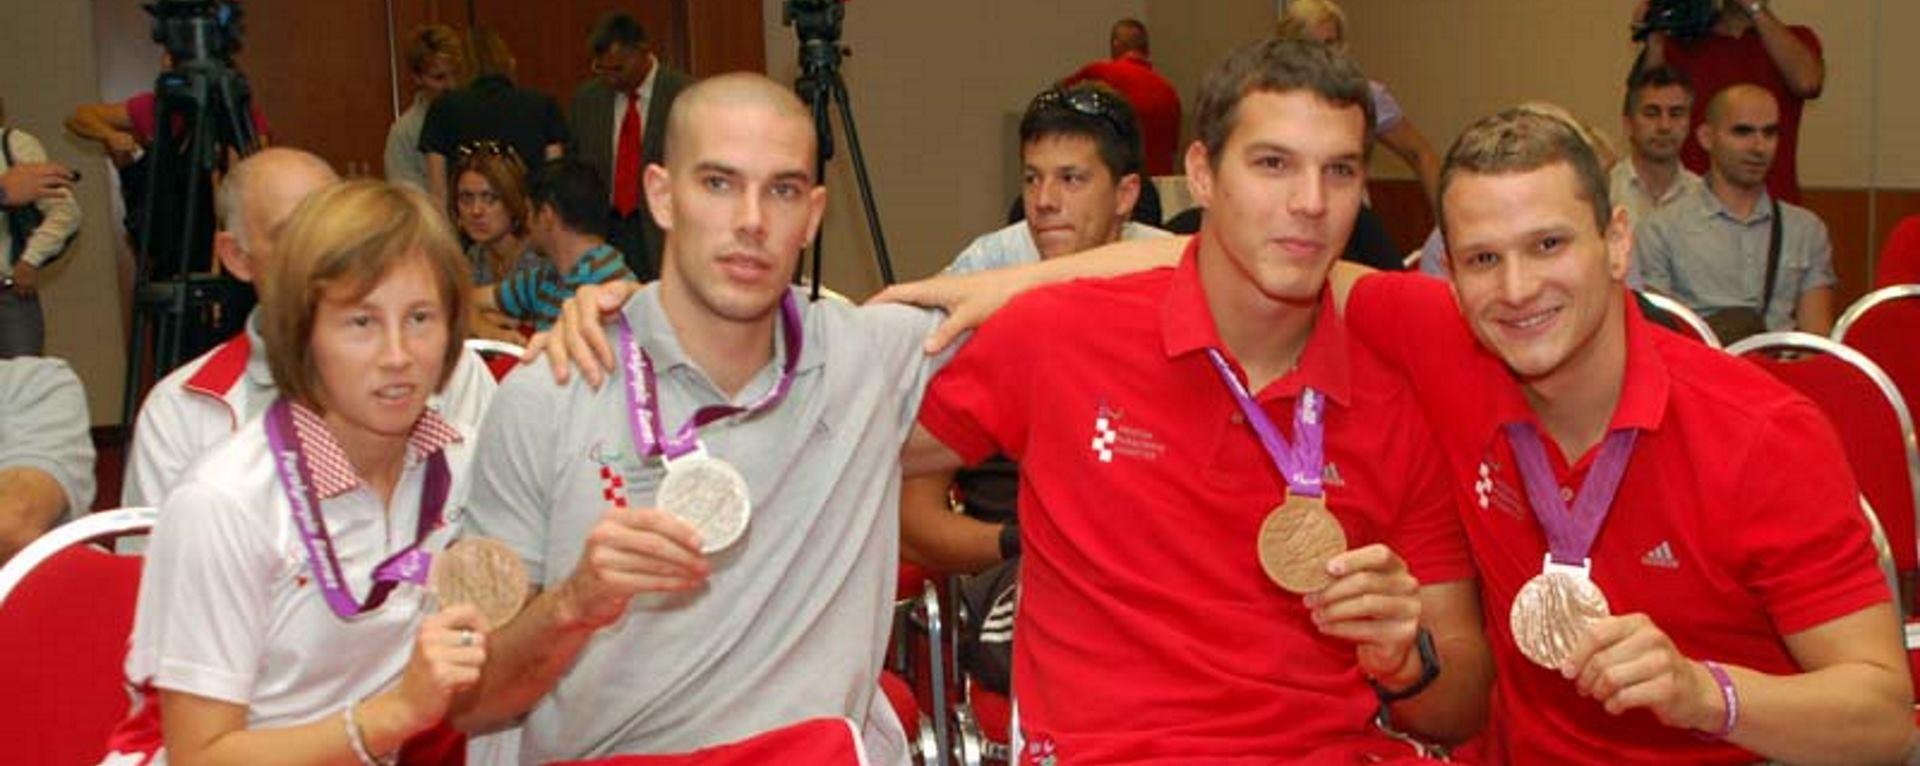 USPJEH ATLETSKE REPREZENTACIJE Hrvatski atletičari vratili se iz Južne Koreje s četiri medalje